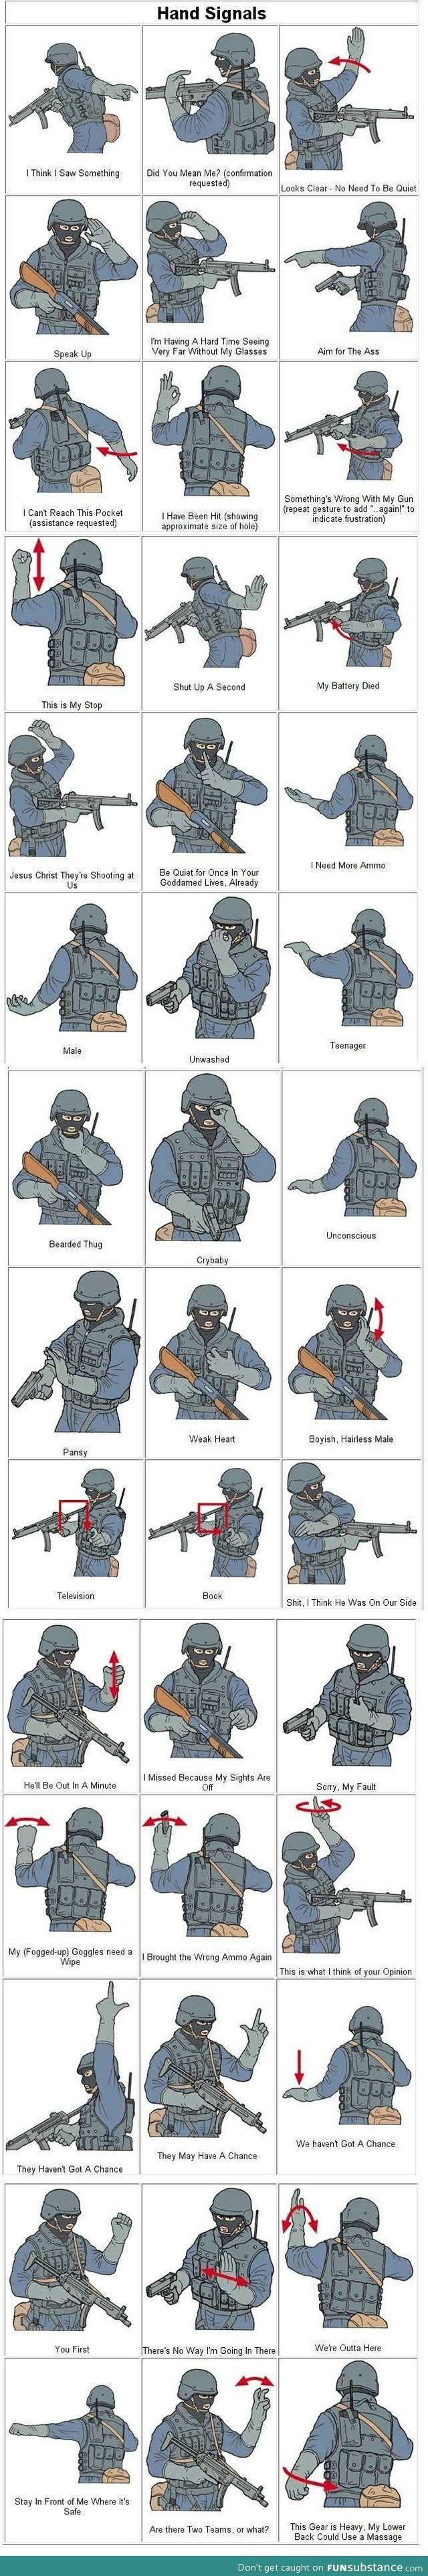 Military sign language